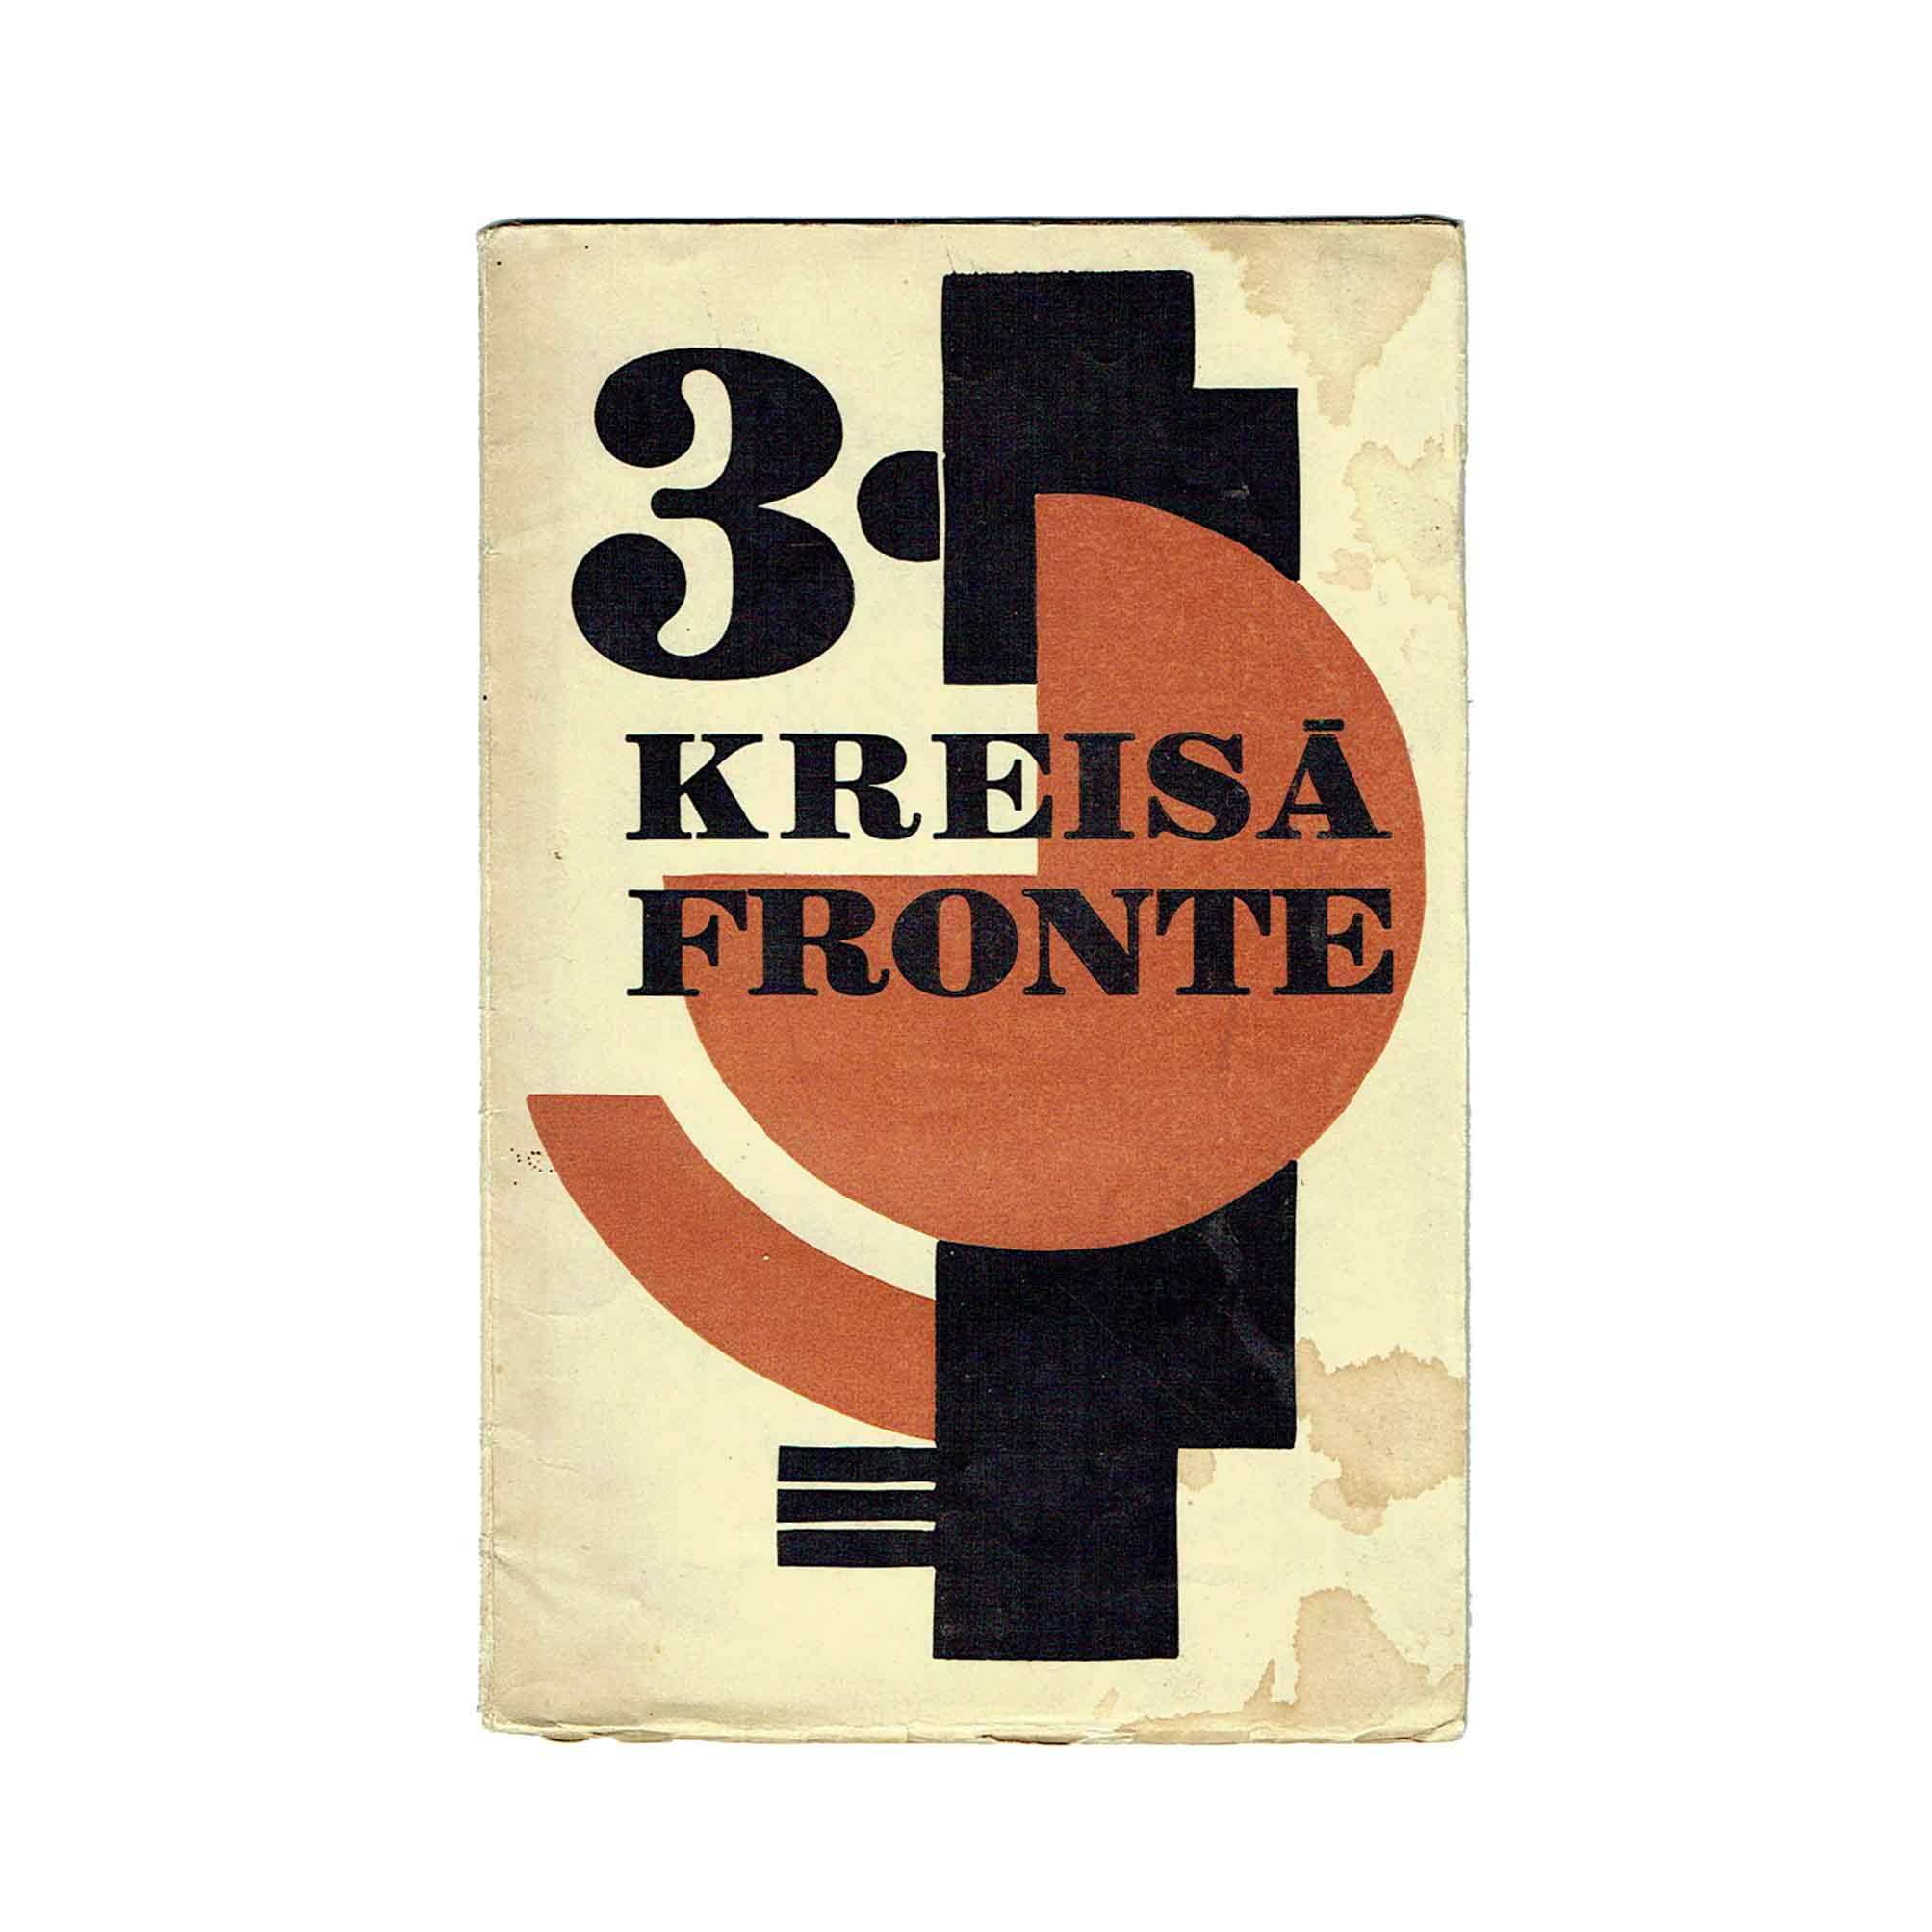 5833K-Kreisa-Front-3-1929-Umschlag-recto-frei-N.jpeg